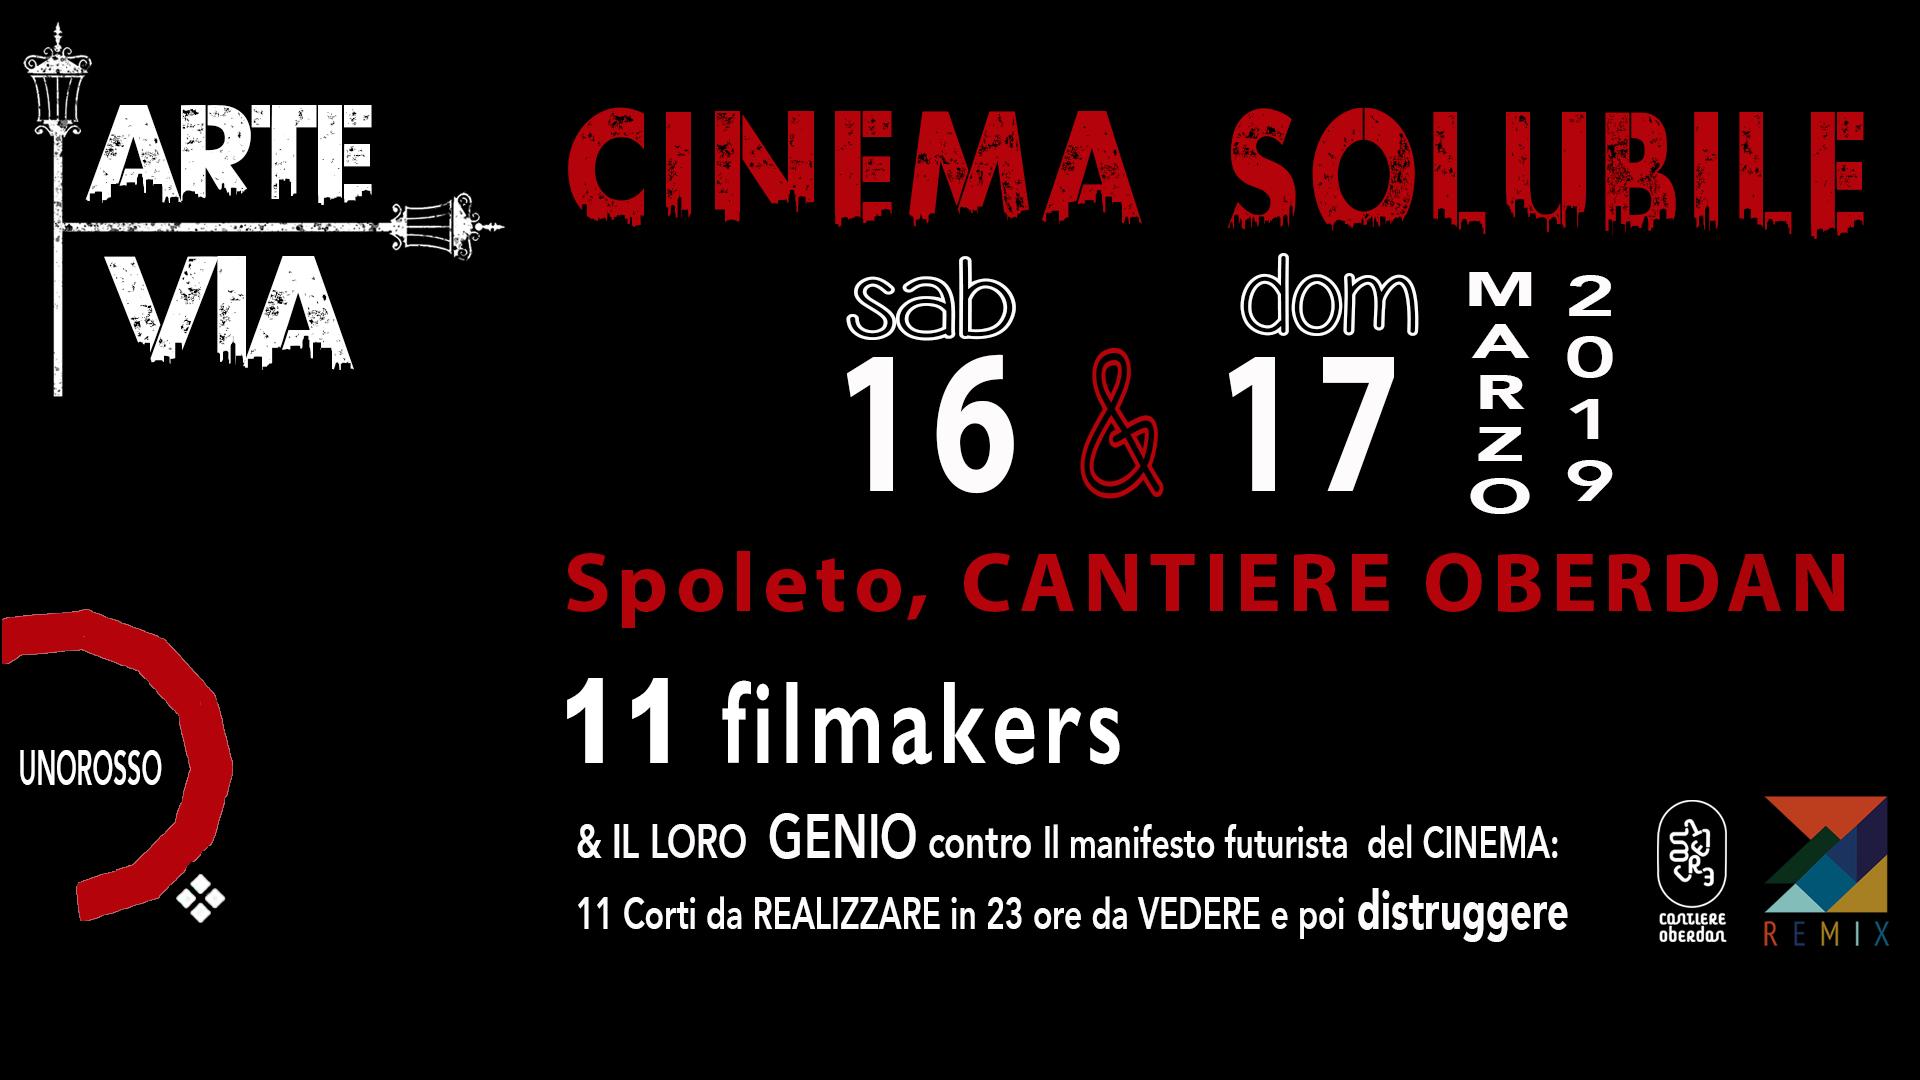 CINEMA SOLUBILE